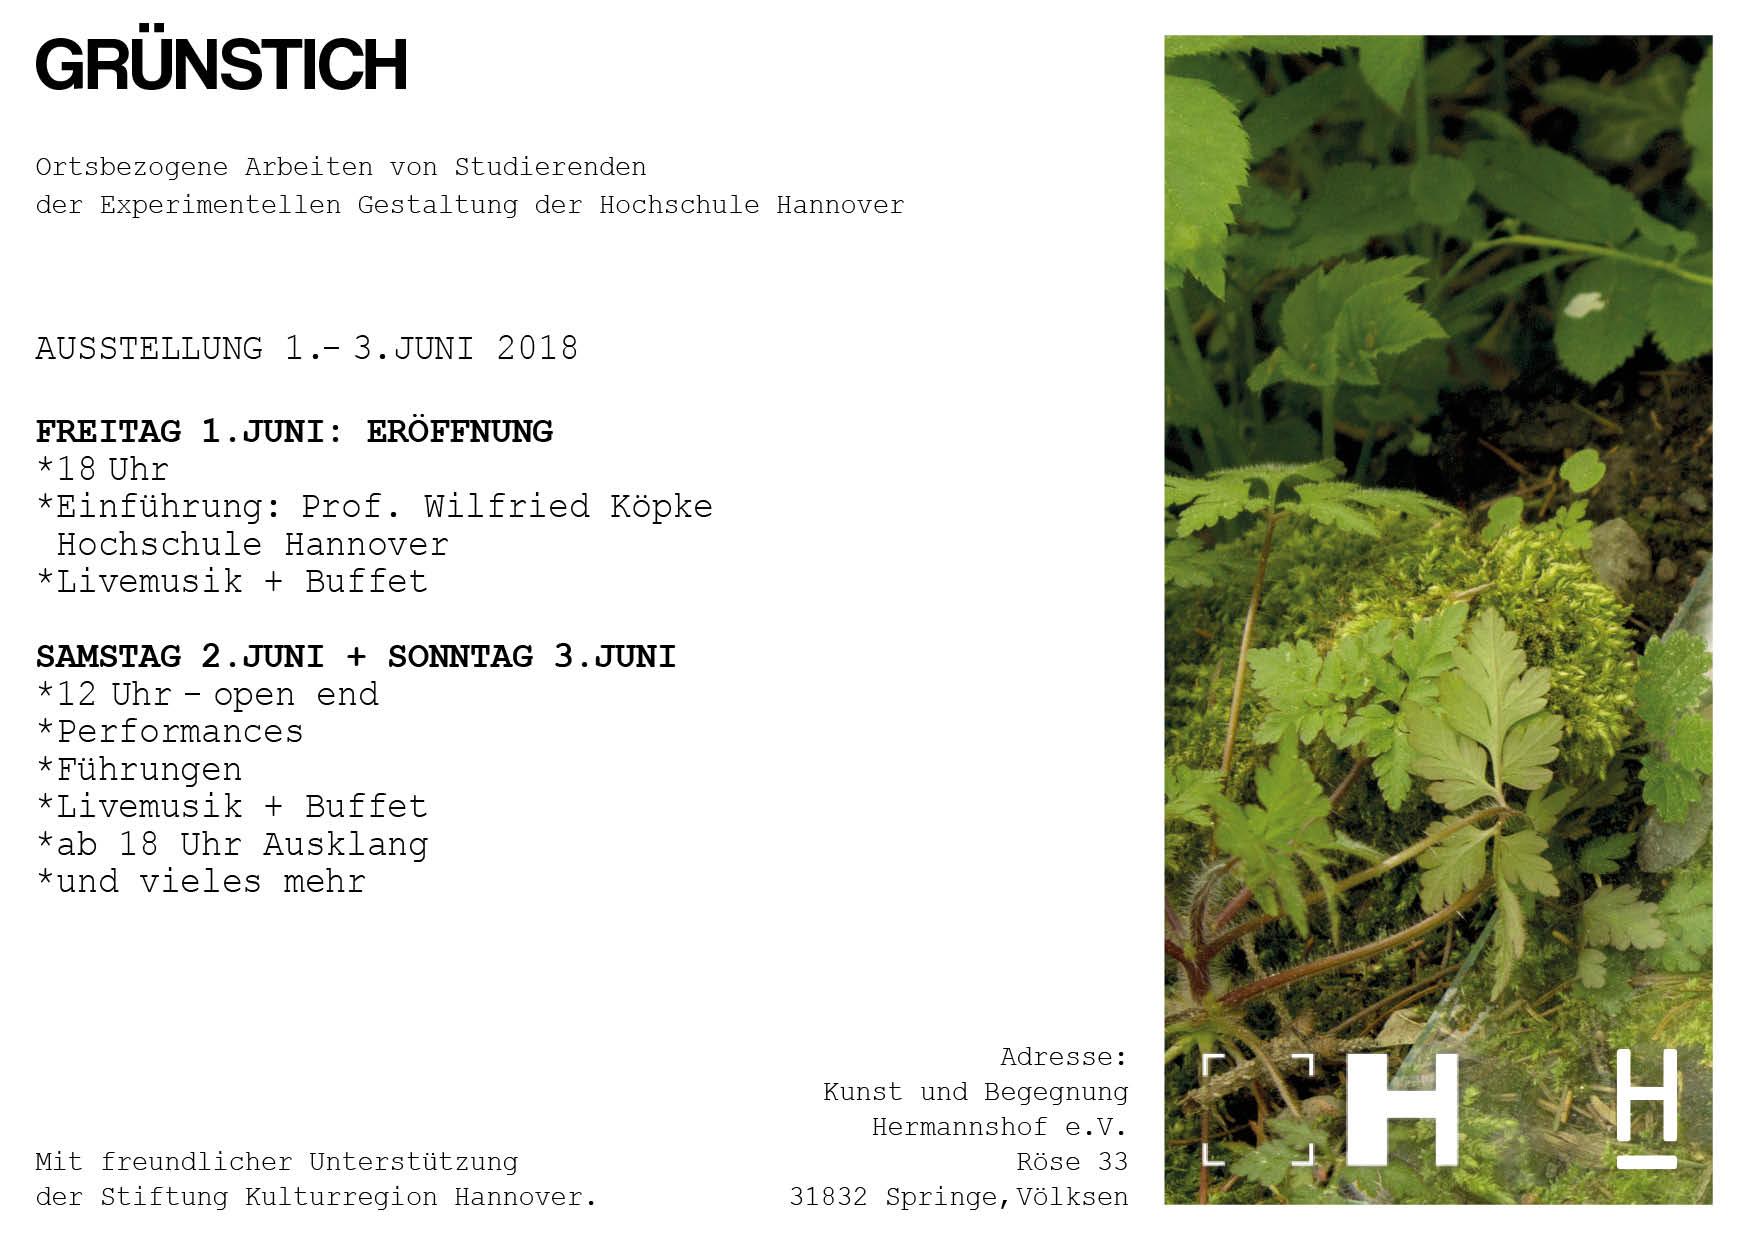 Gruenstich_Postkarte_080518_Rueckseite